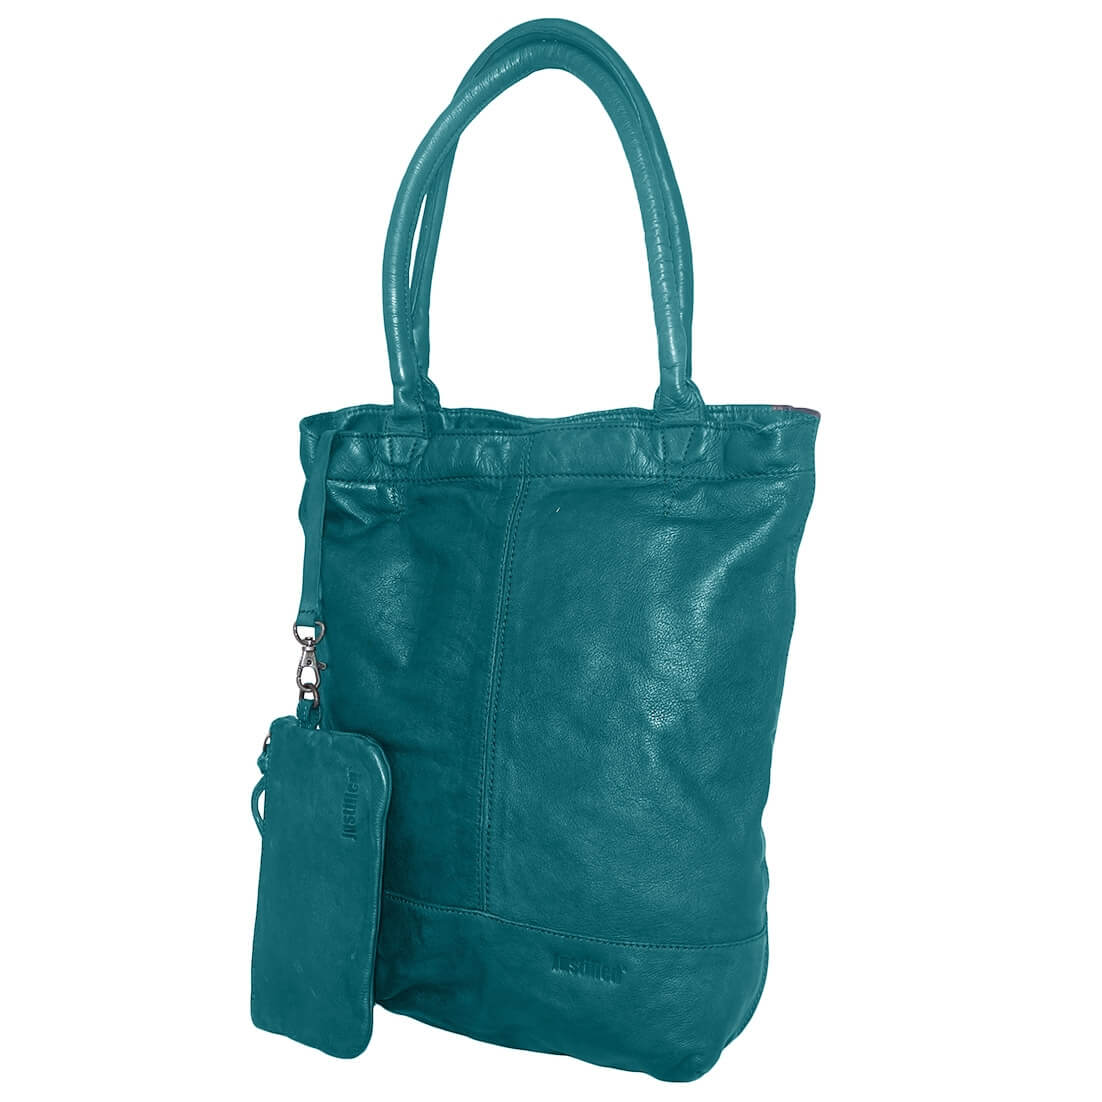 Justified Leren Shopper met Etui Turquoise